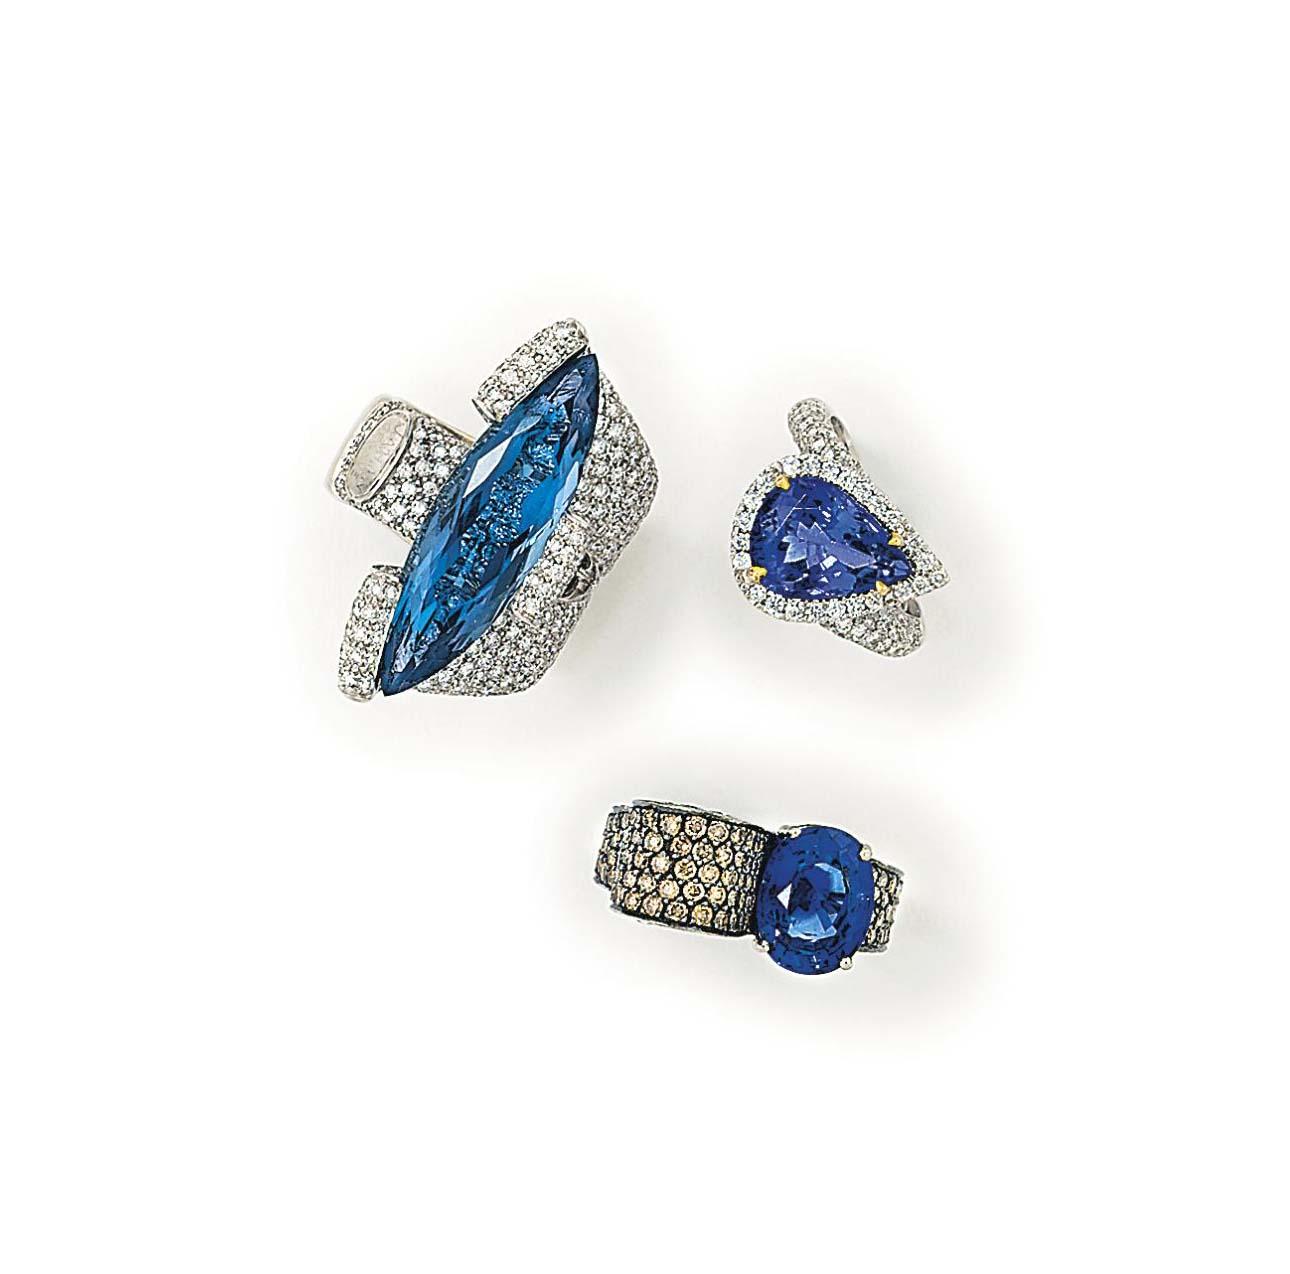 SIX DIAMOND AND GEM-SET DRESS RINGS